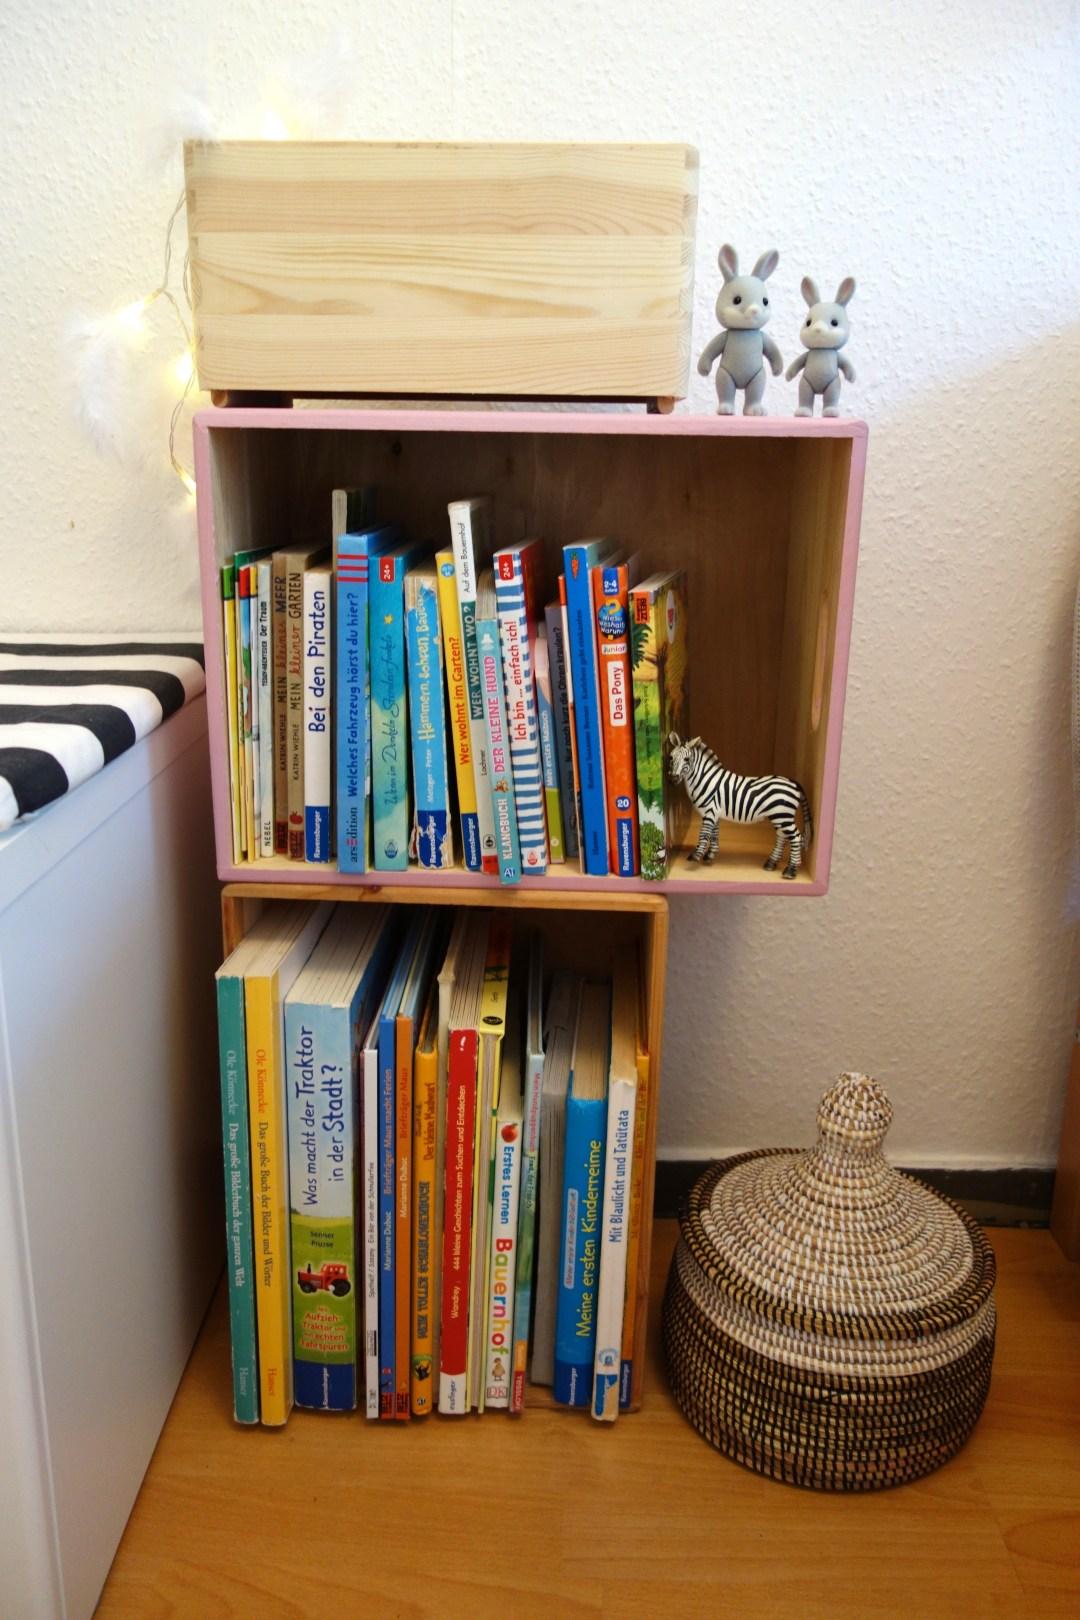 Full Size of Regale Kinderzimmer Sofa Regal Weiß Kinderzimmer Kinderzimmer Bücherregal